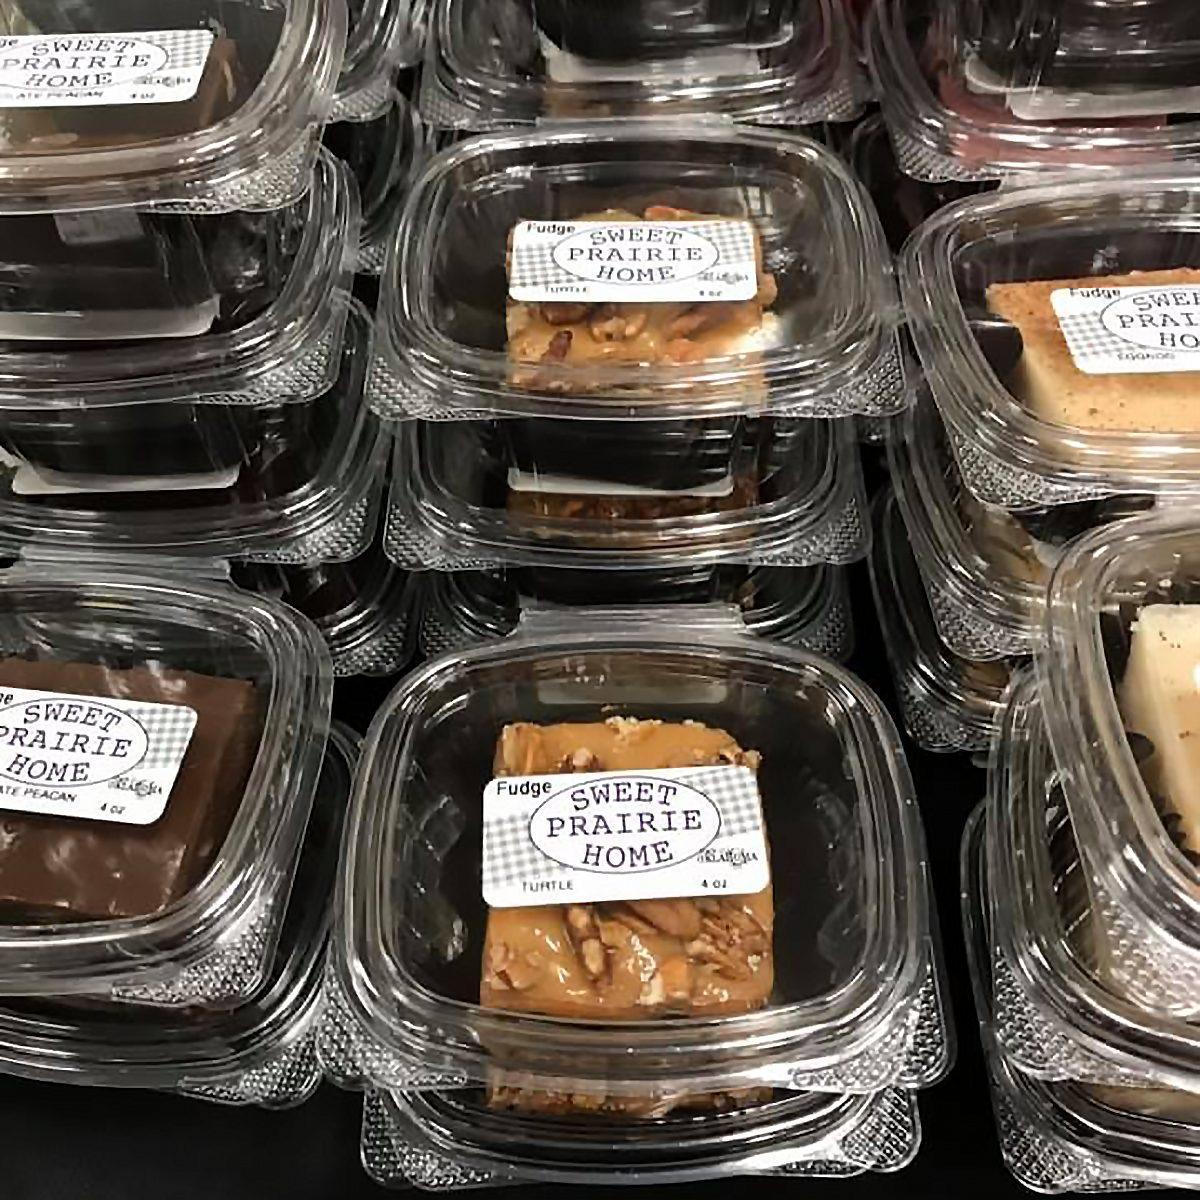 The Best Fudge Shop in Oklahoma - Sweet Prairie Home